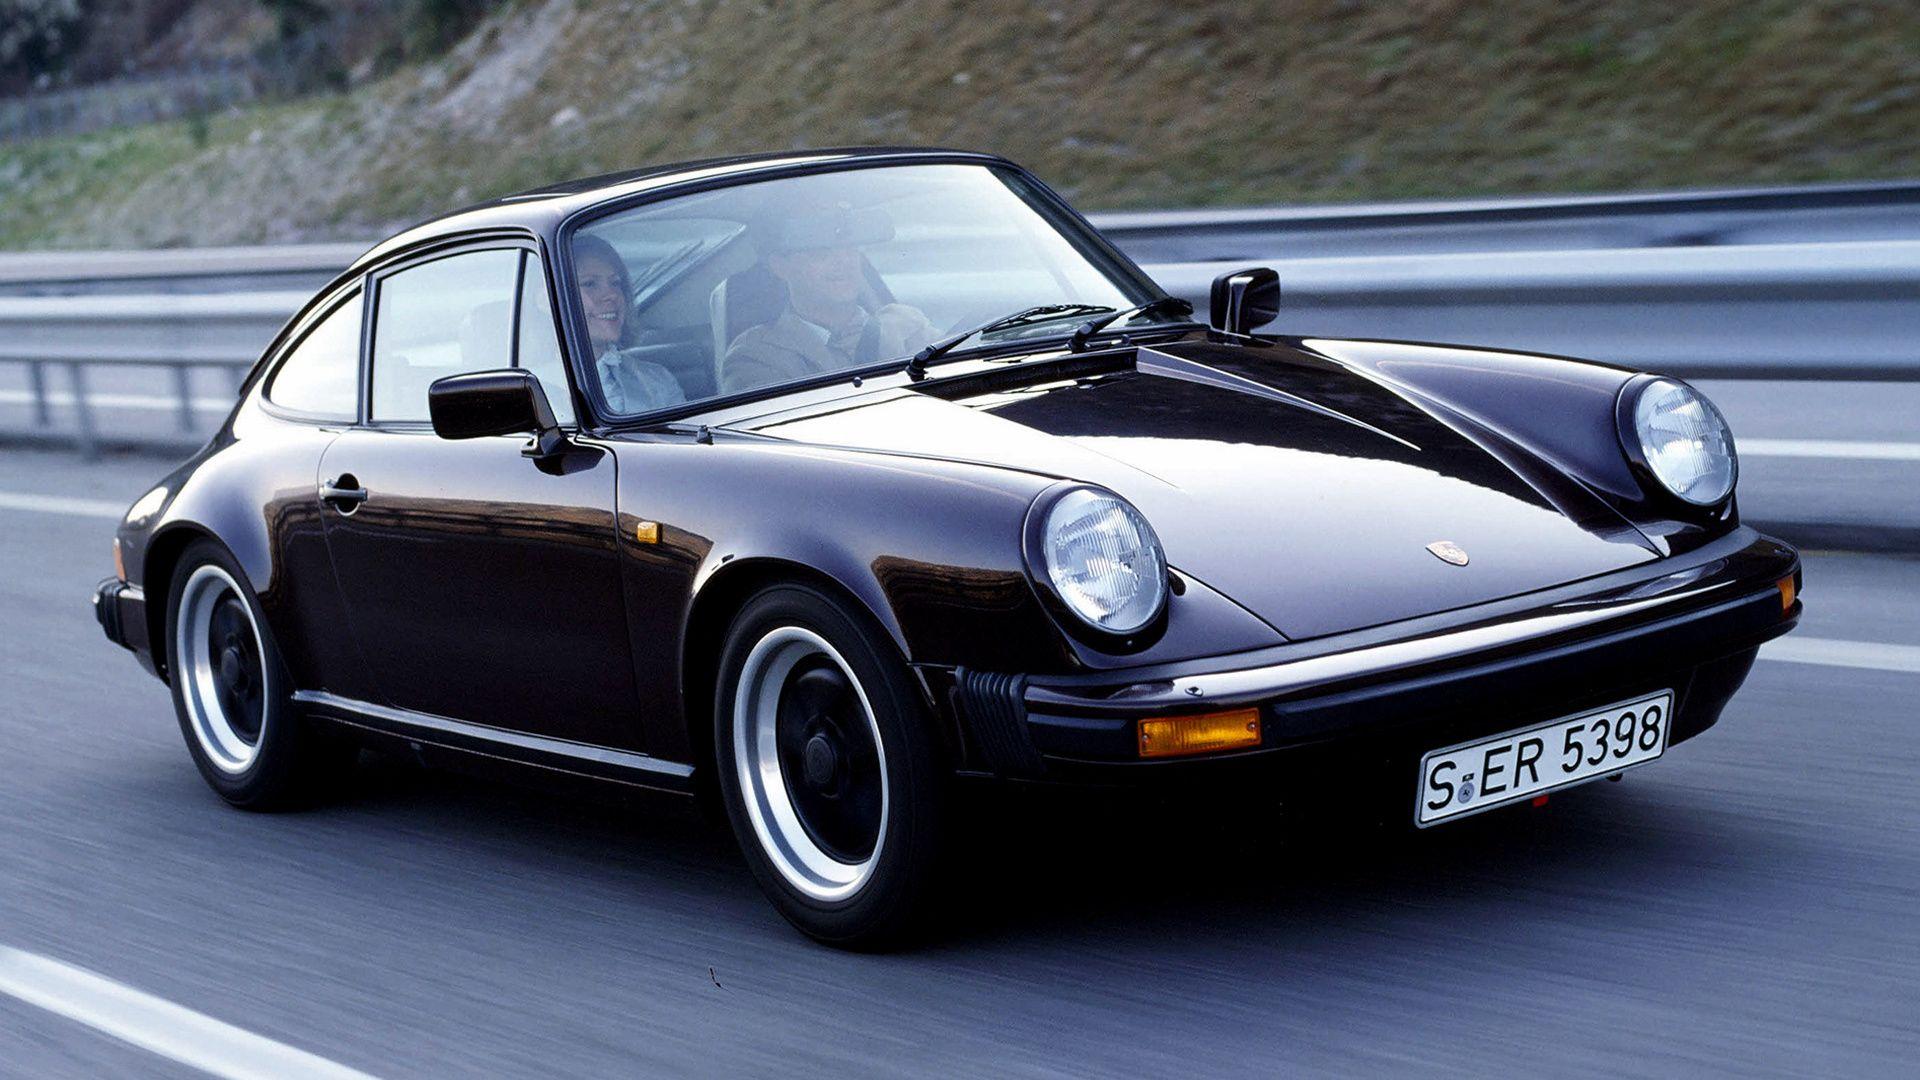 Porsche 911 SC Wallpapers   Top Porsche 911 SC Backgrounds 1920x1080